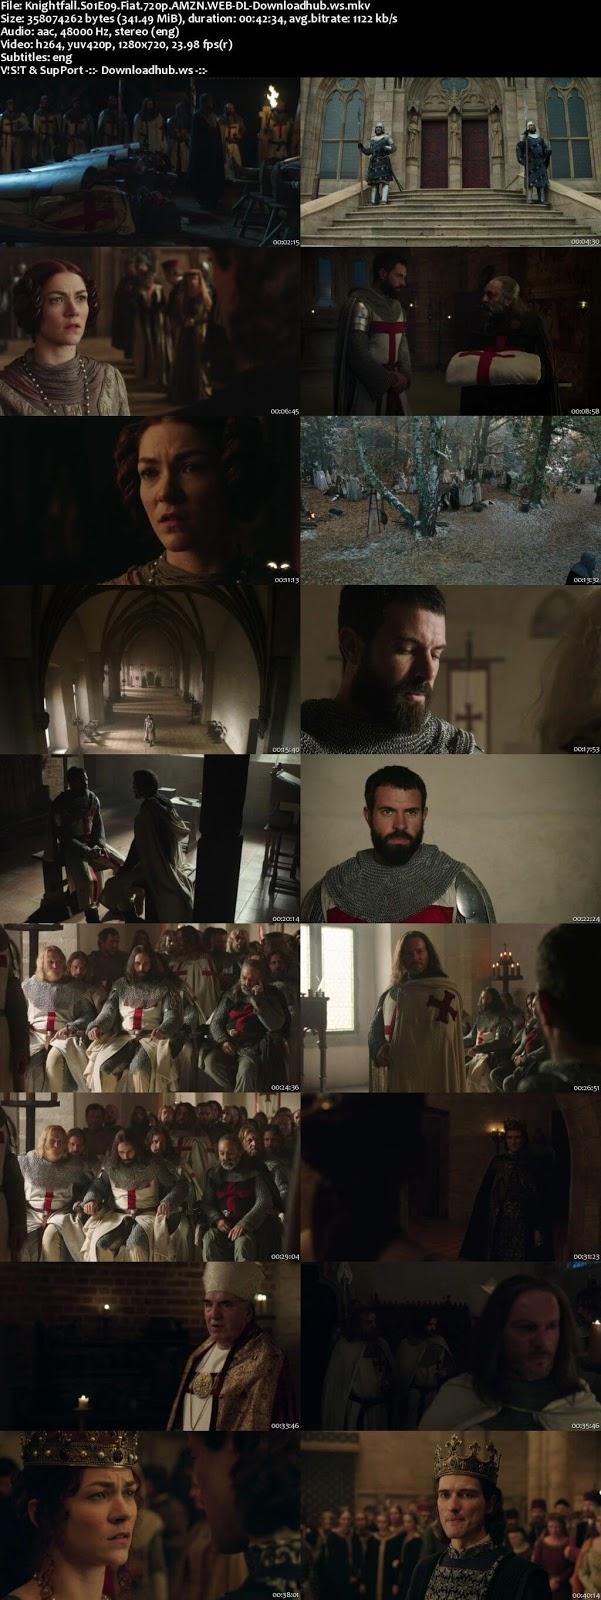 Knightfall S01E09 340MB WEB-DL 720p ESubs